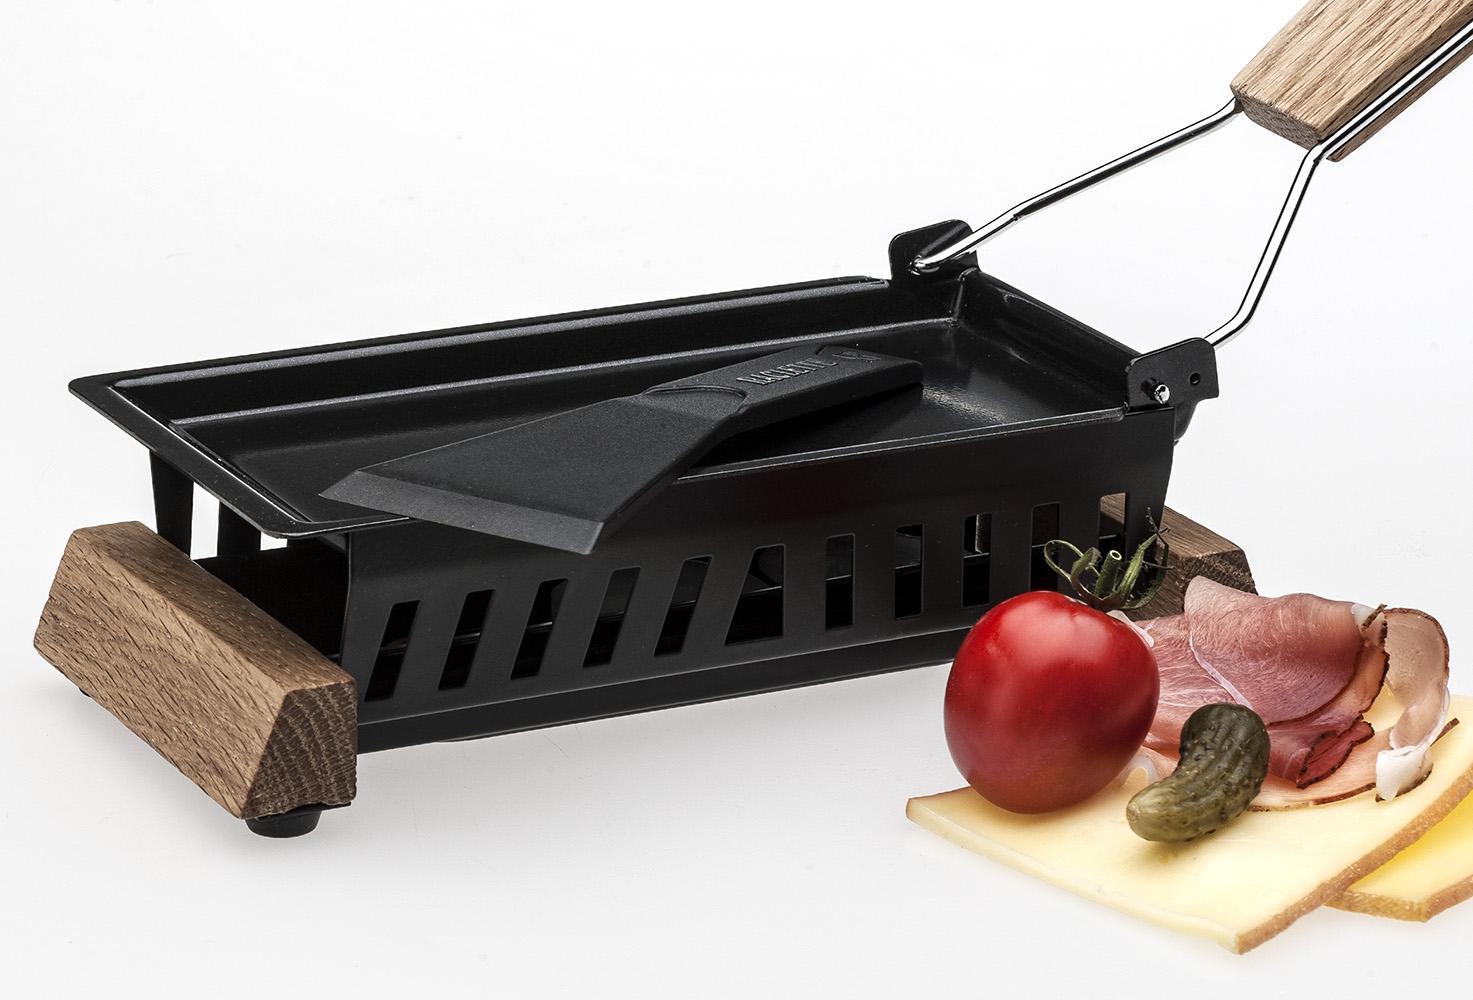 Produktfoto-Küchenprofi